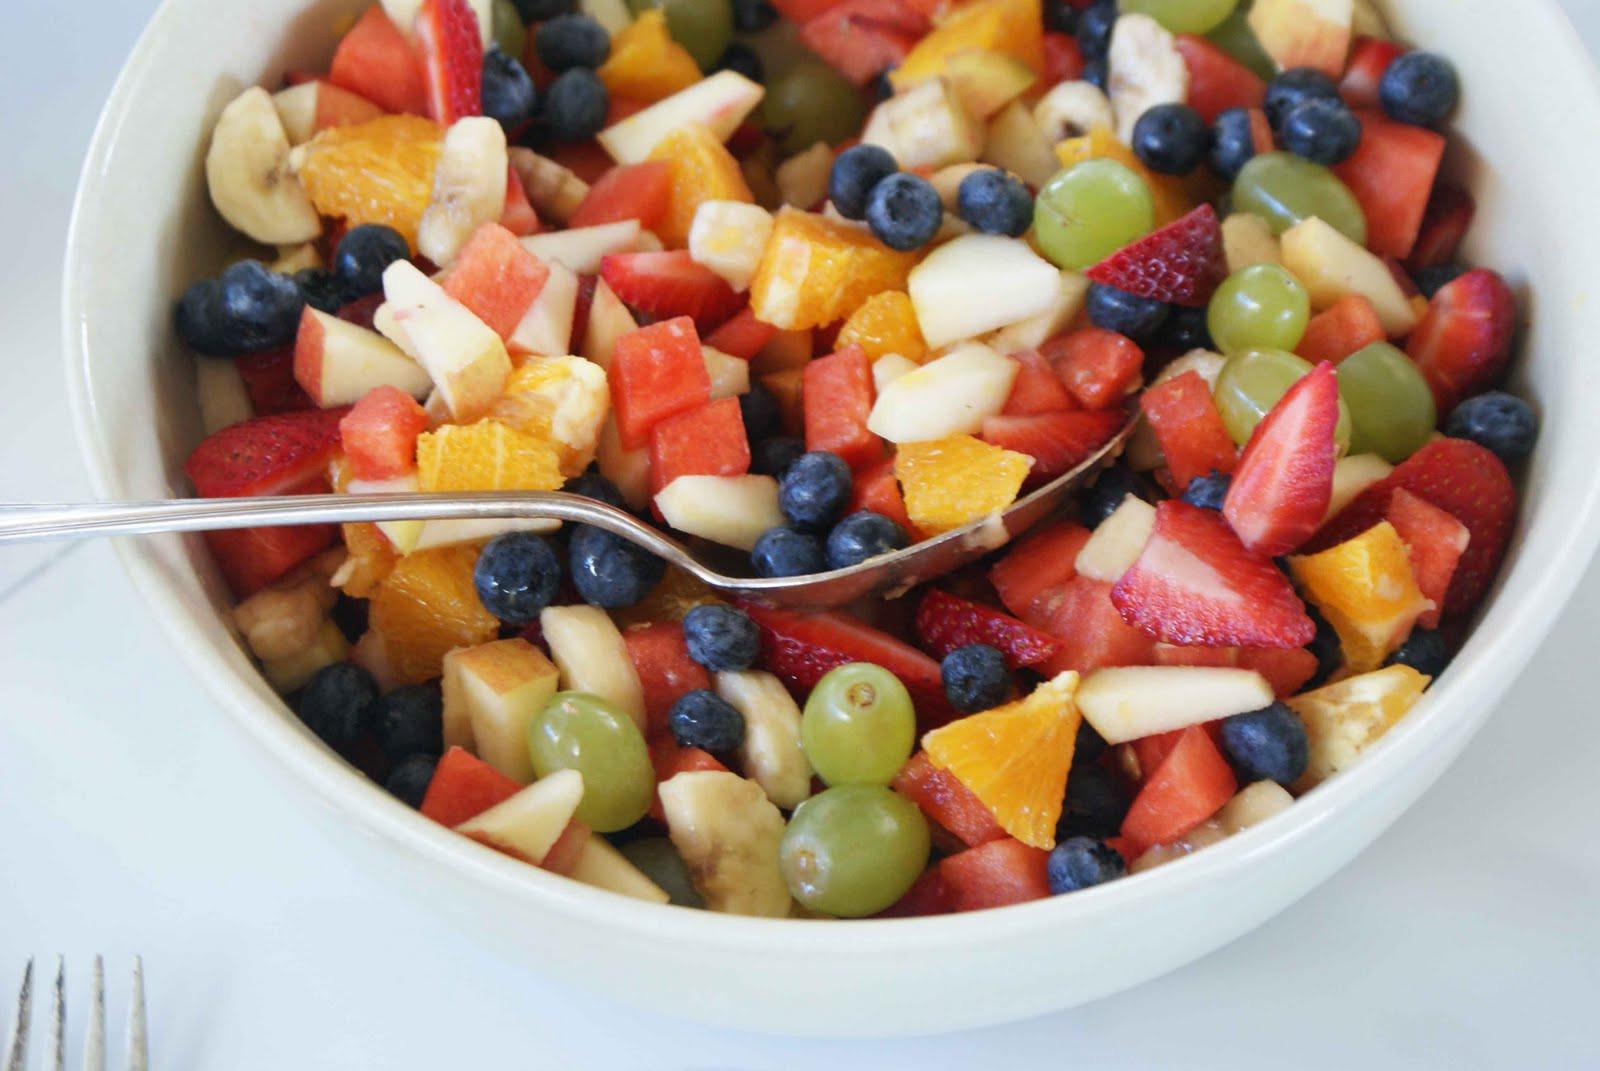 Fruit Salads For Easter Dinner  An Easter in Dinner With Julie